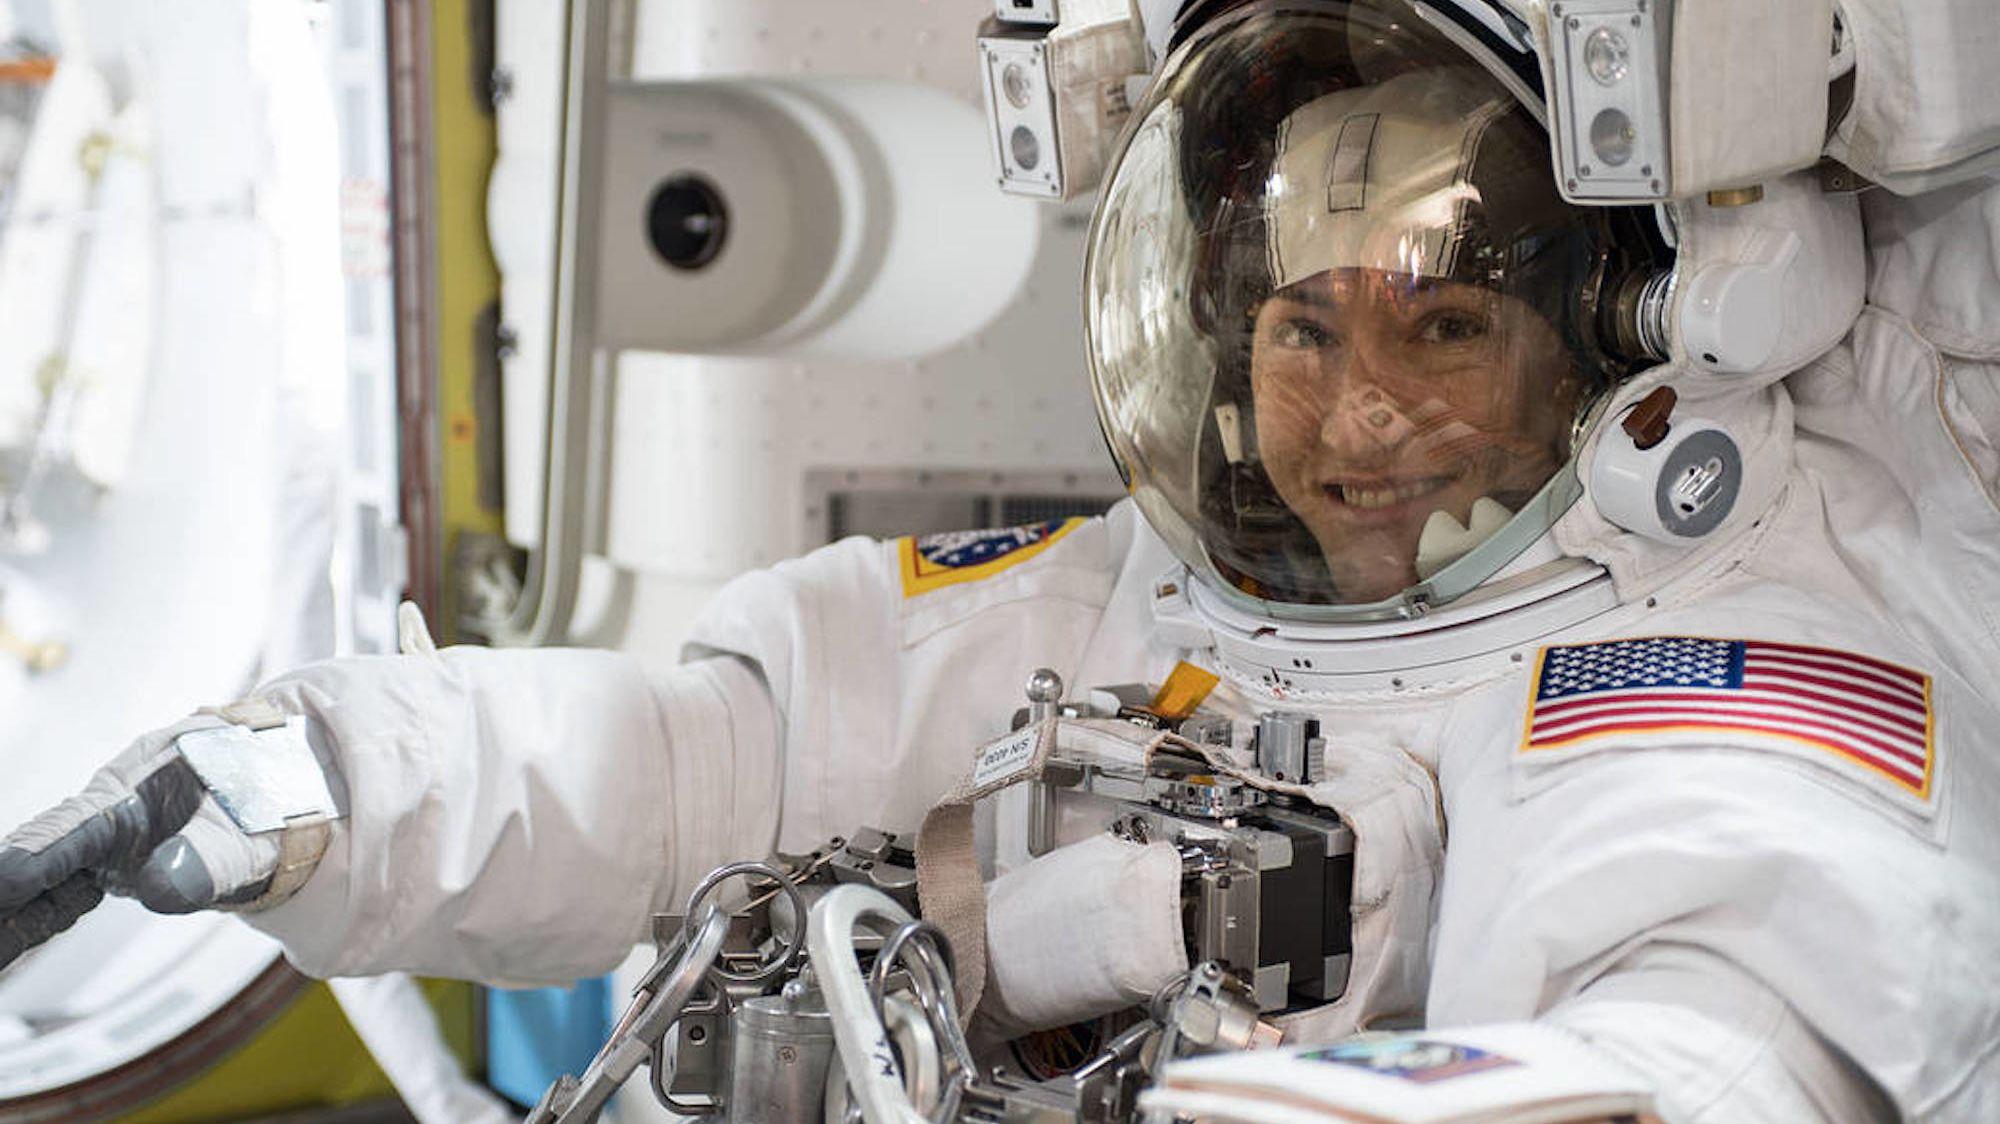 NASA First All-Female Spacewalk Happening - Mental Floss